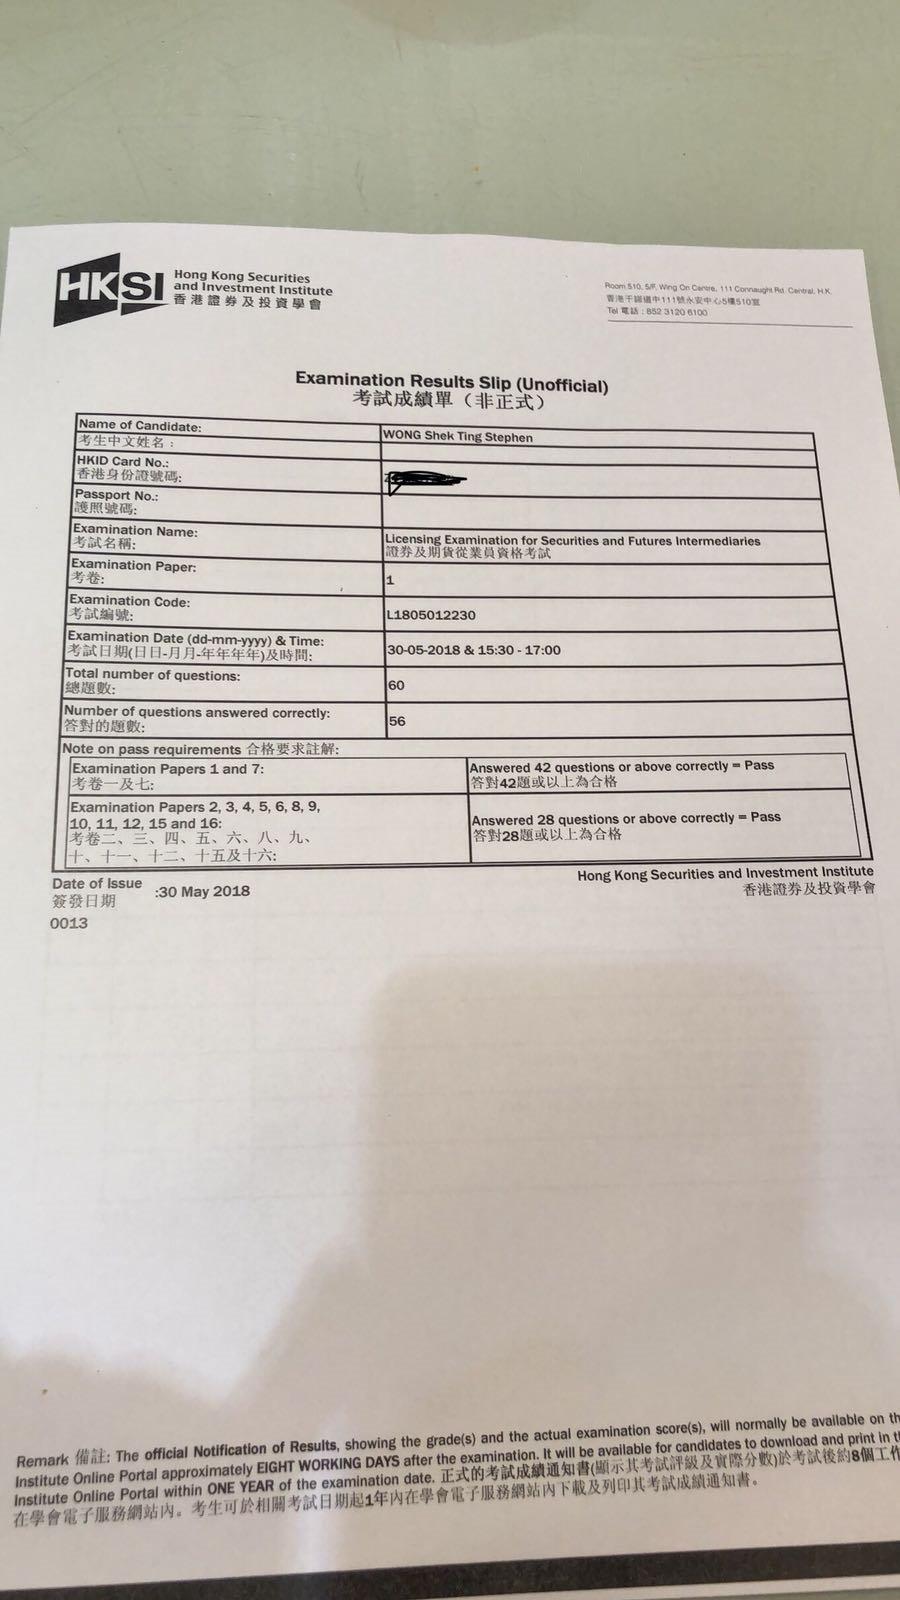 STSW 30/5/2018 LE Paper 1 證券期貨從業員資格考試卷一 Pass